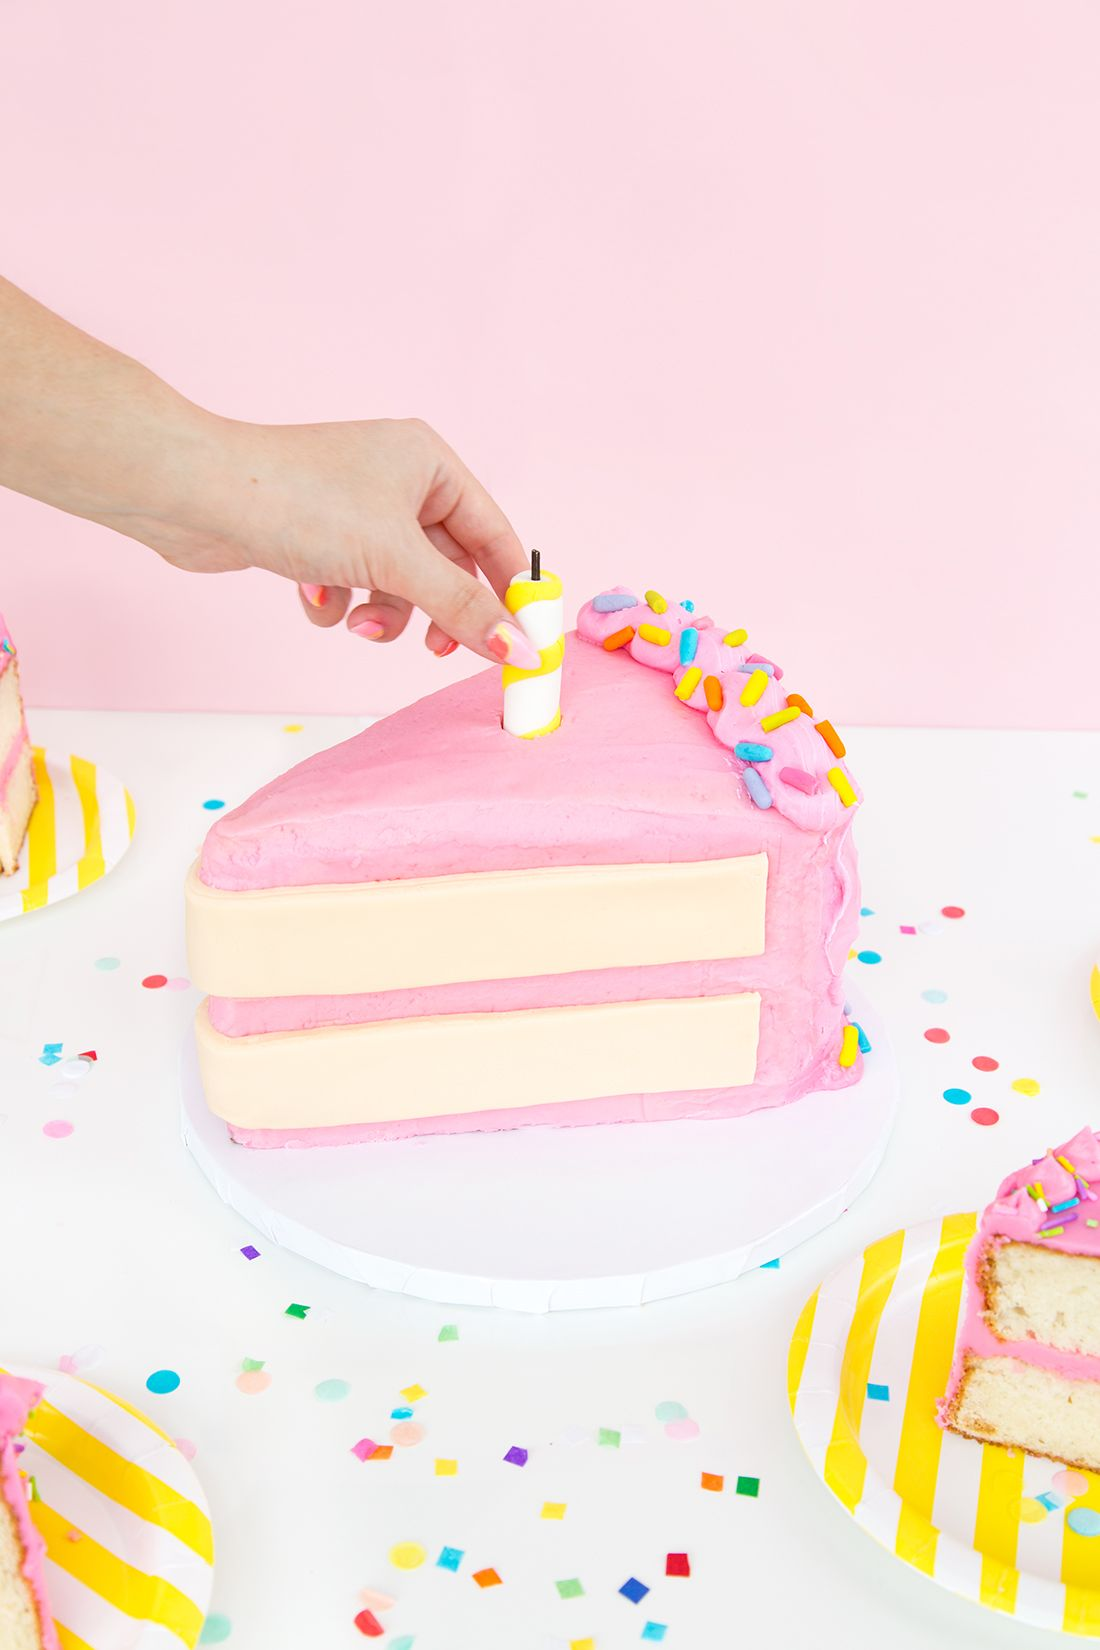 Fabulous Giant Cake Slice Cake Aww Sams 2Nd Birthday With Images Personalised Birthday Cards Paralily Jamesorg